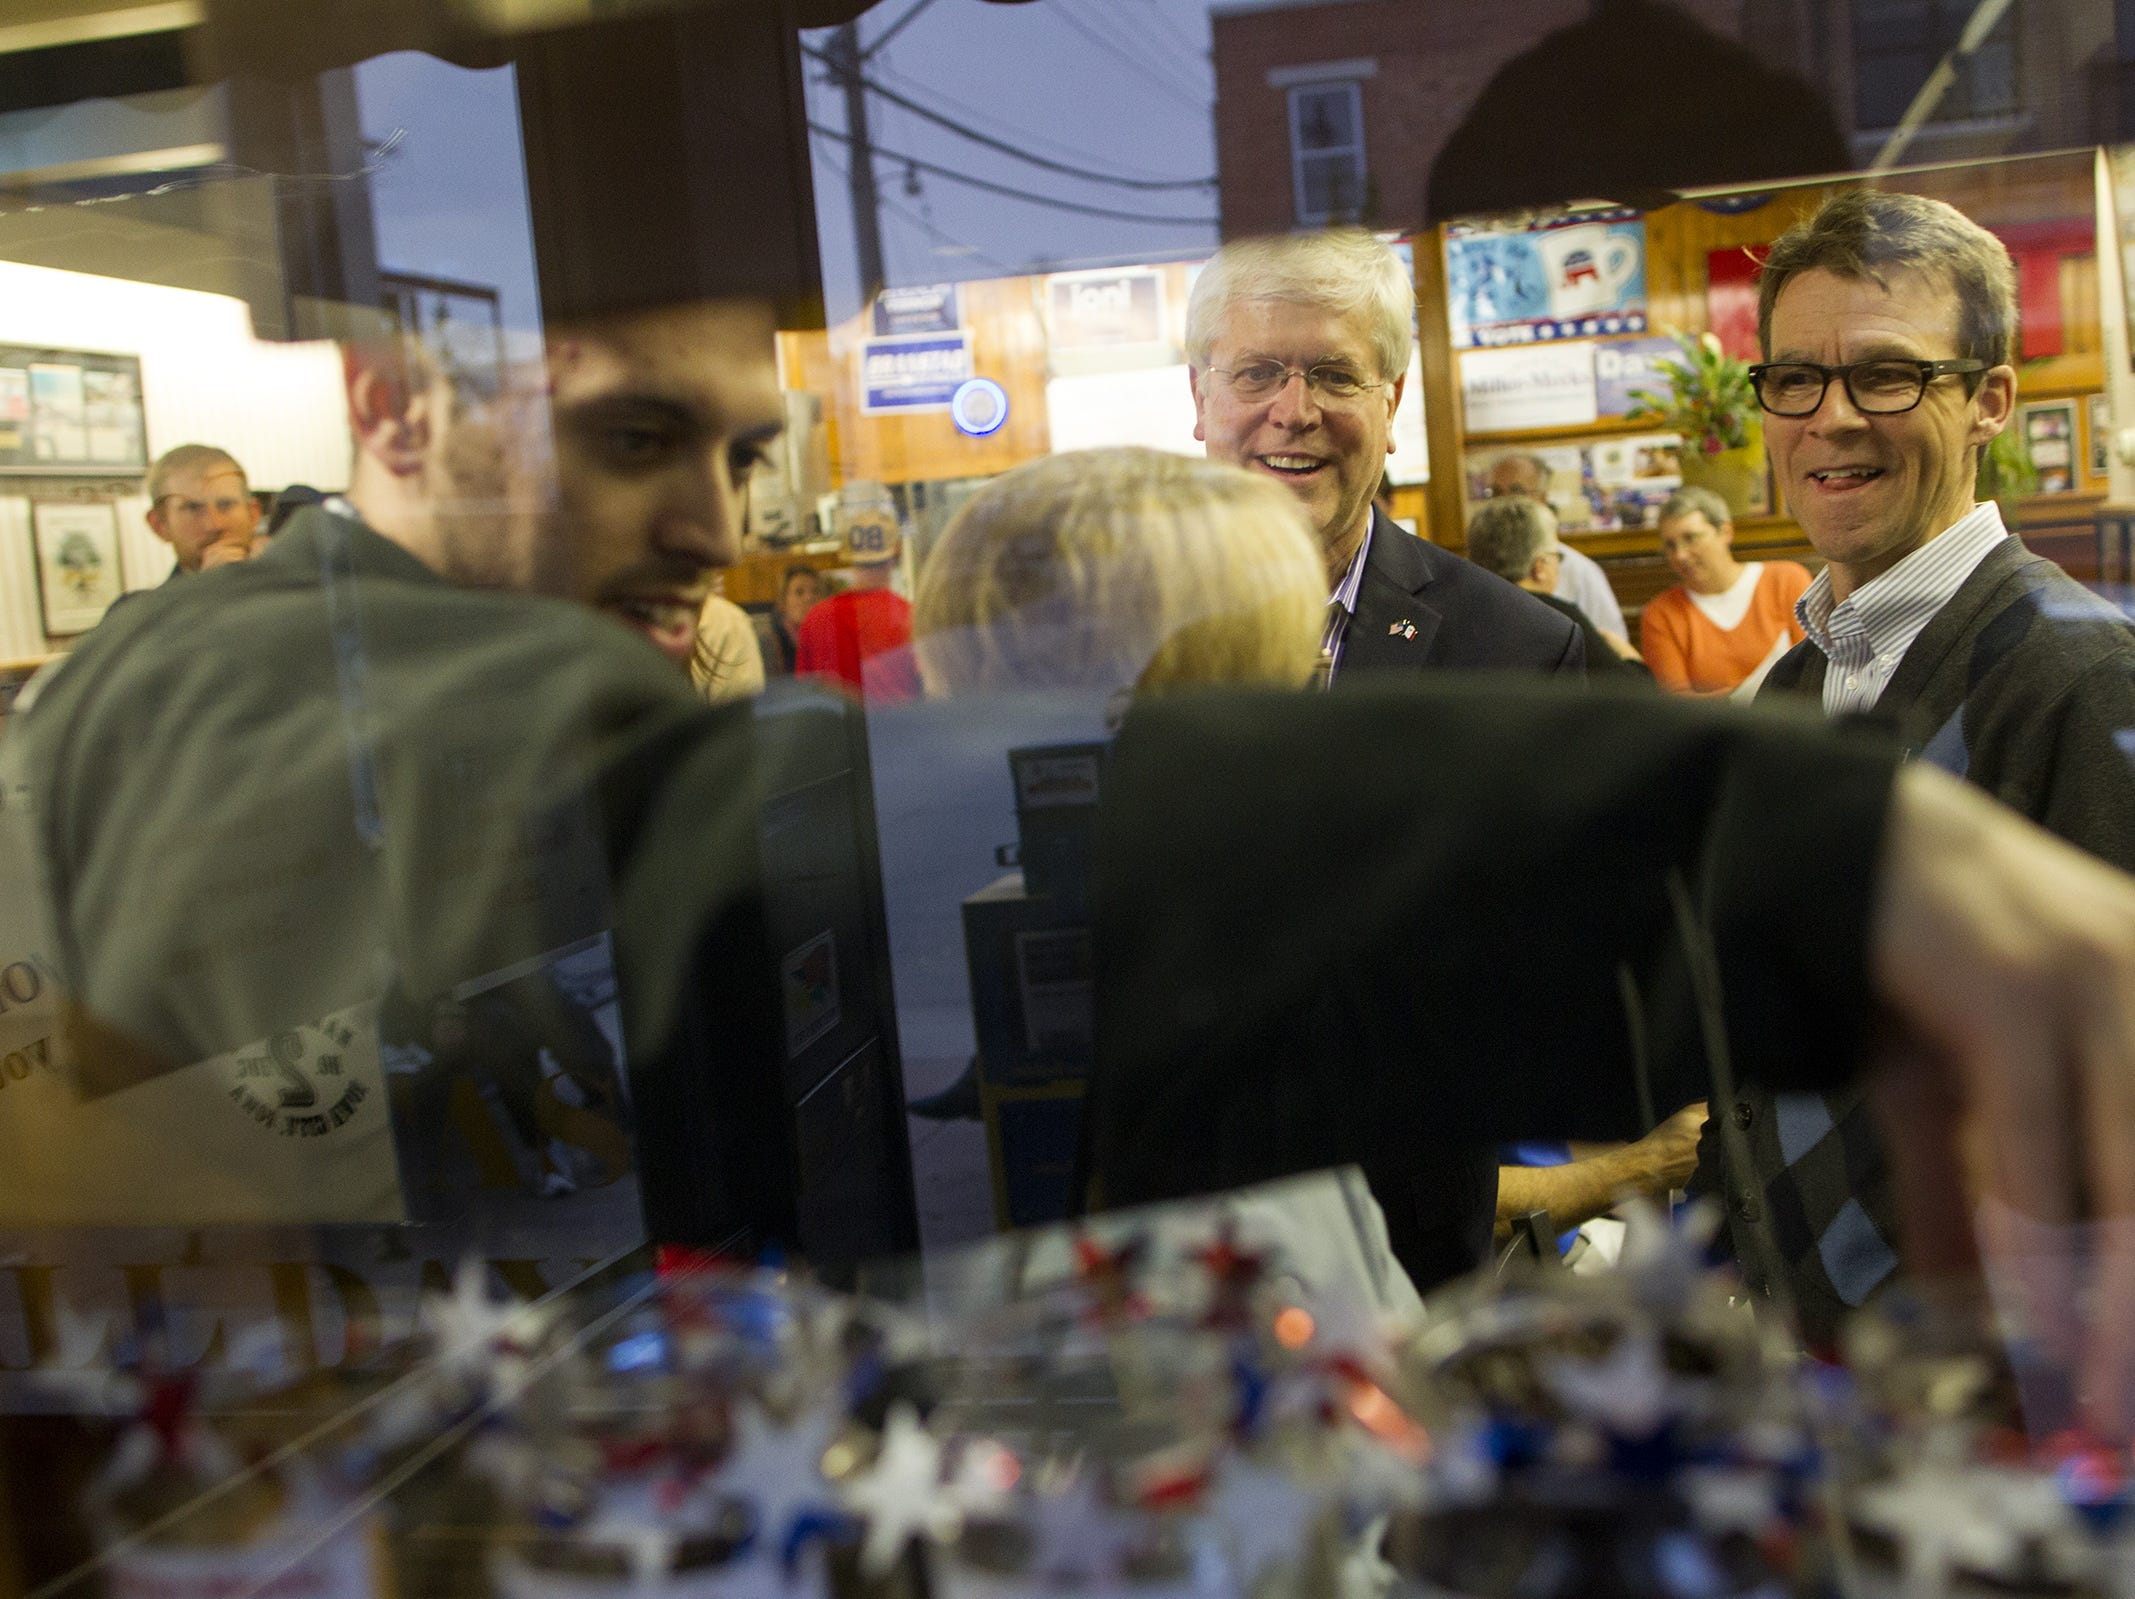 Democratic gubernatorial candidate Jack Hatch checks coffee bean caucus jars at Hamburg Inn on Thursday, Oct. 30, 2014.